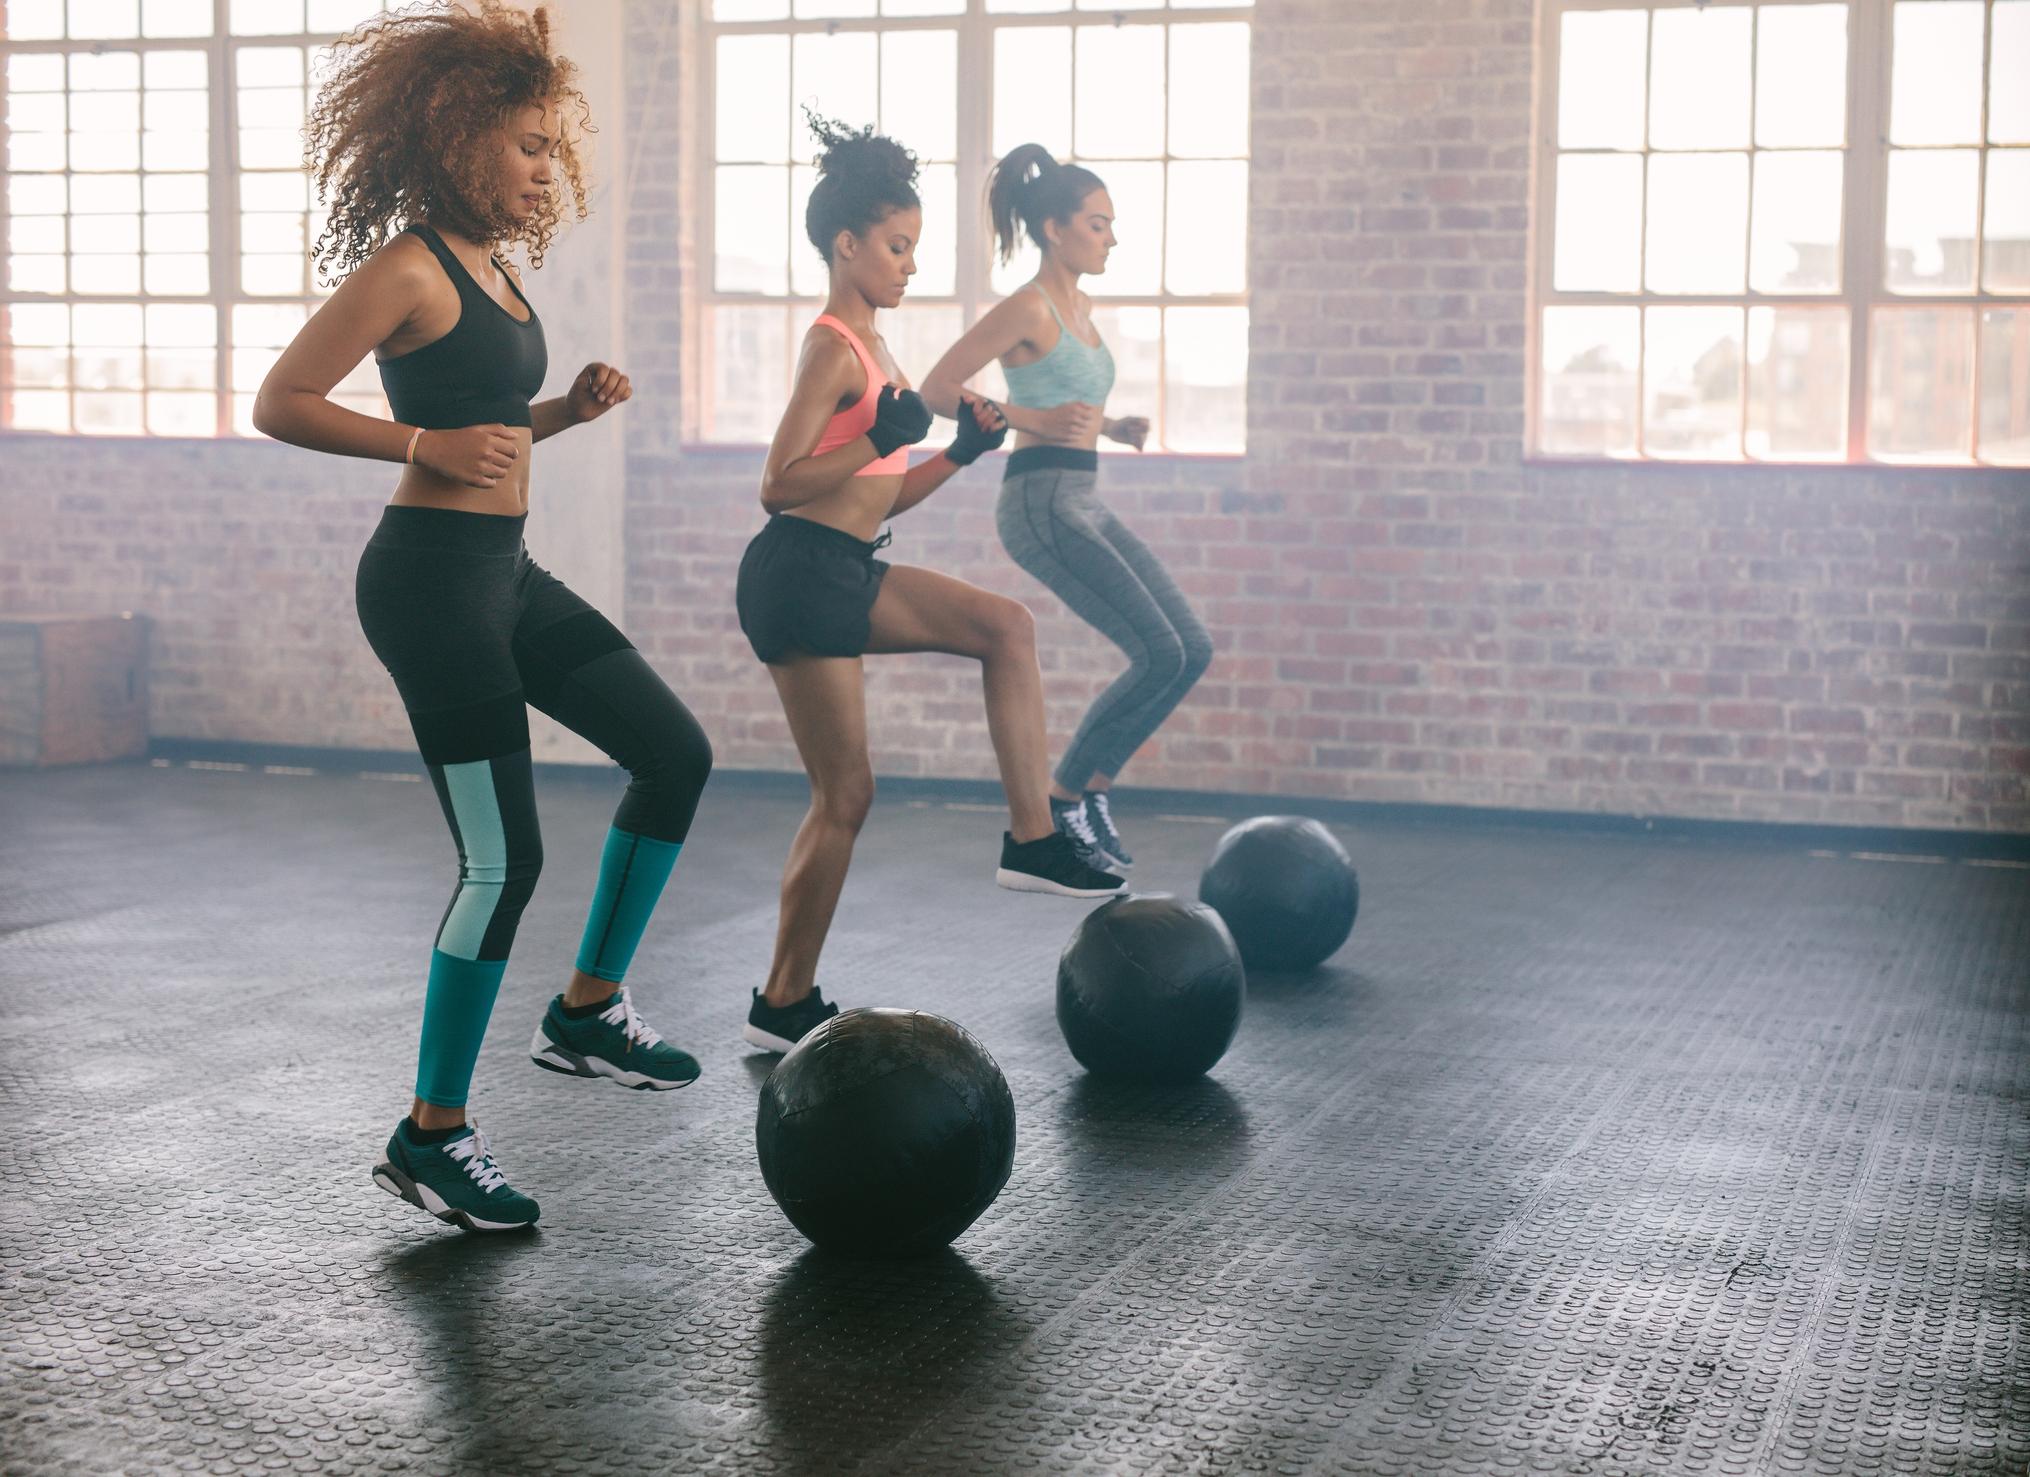 perdre gros exercice de gym